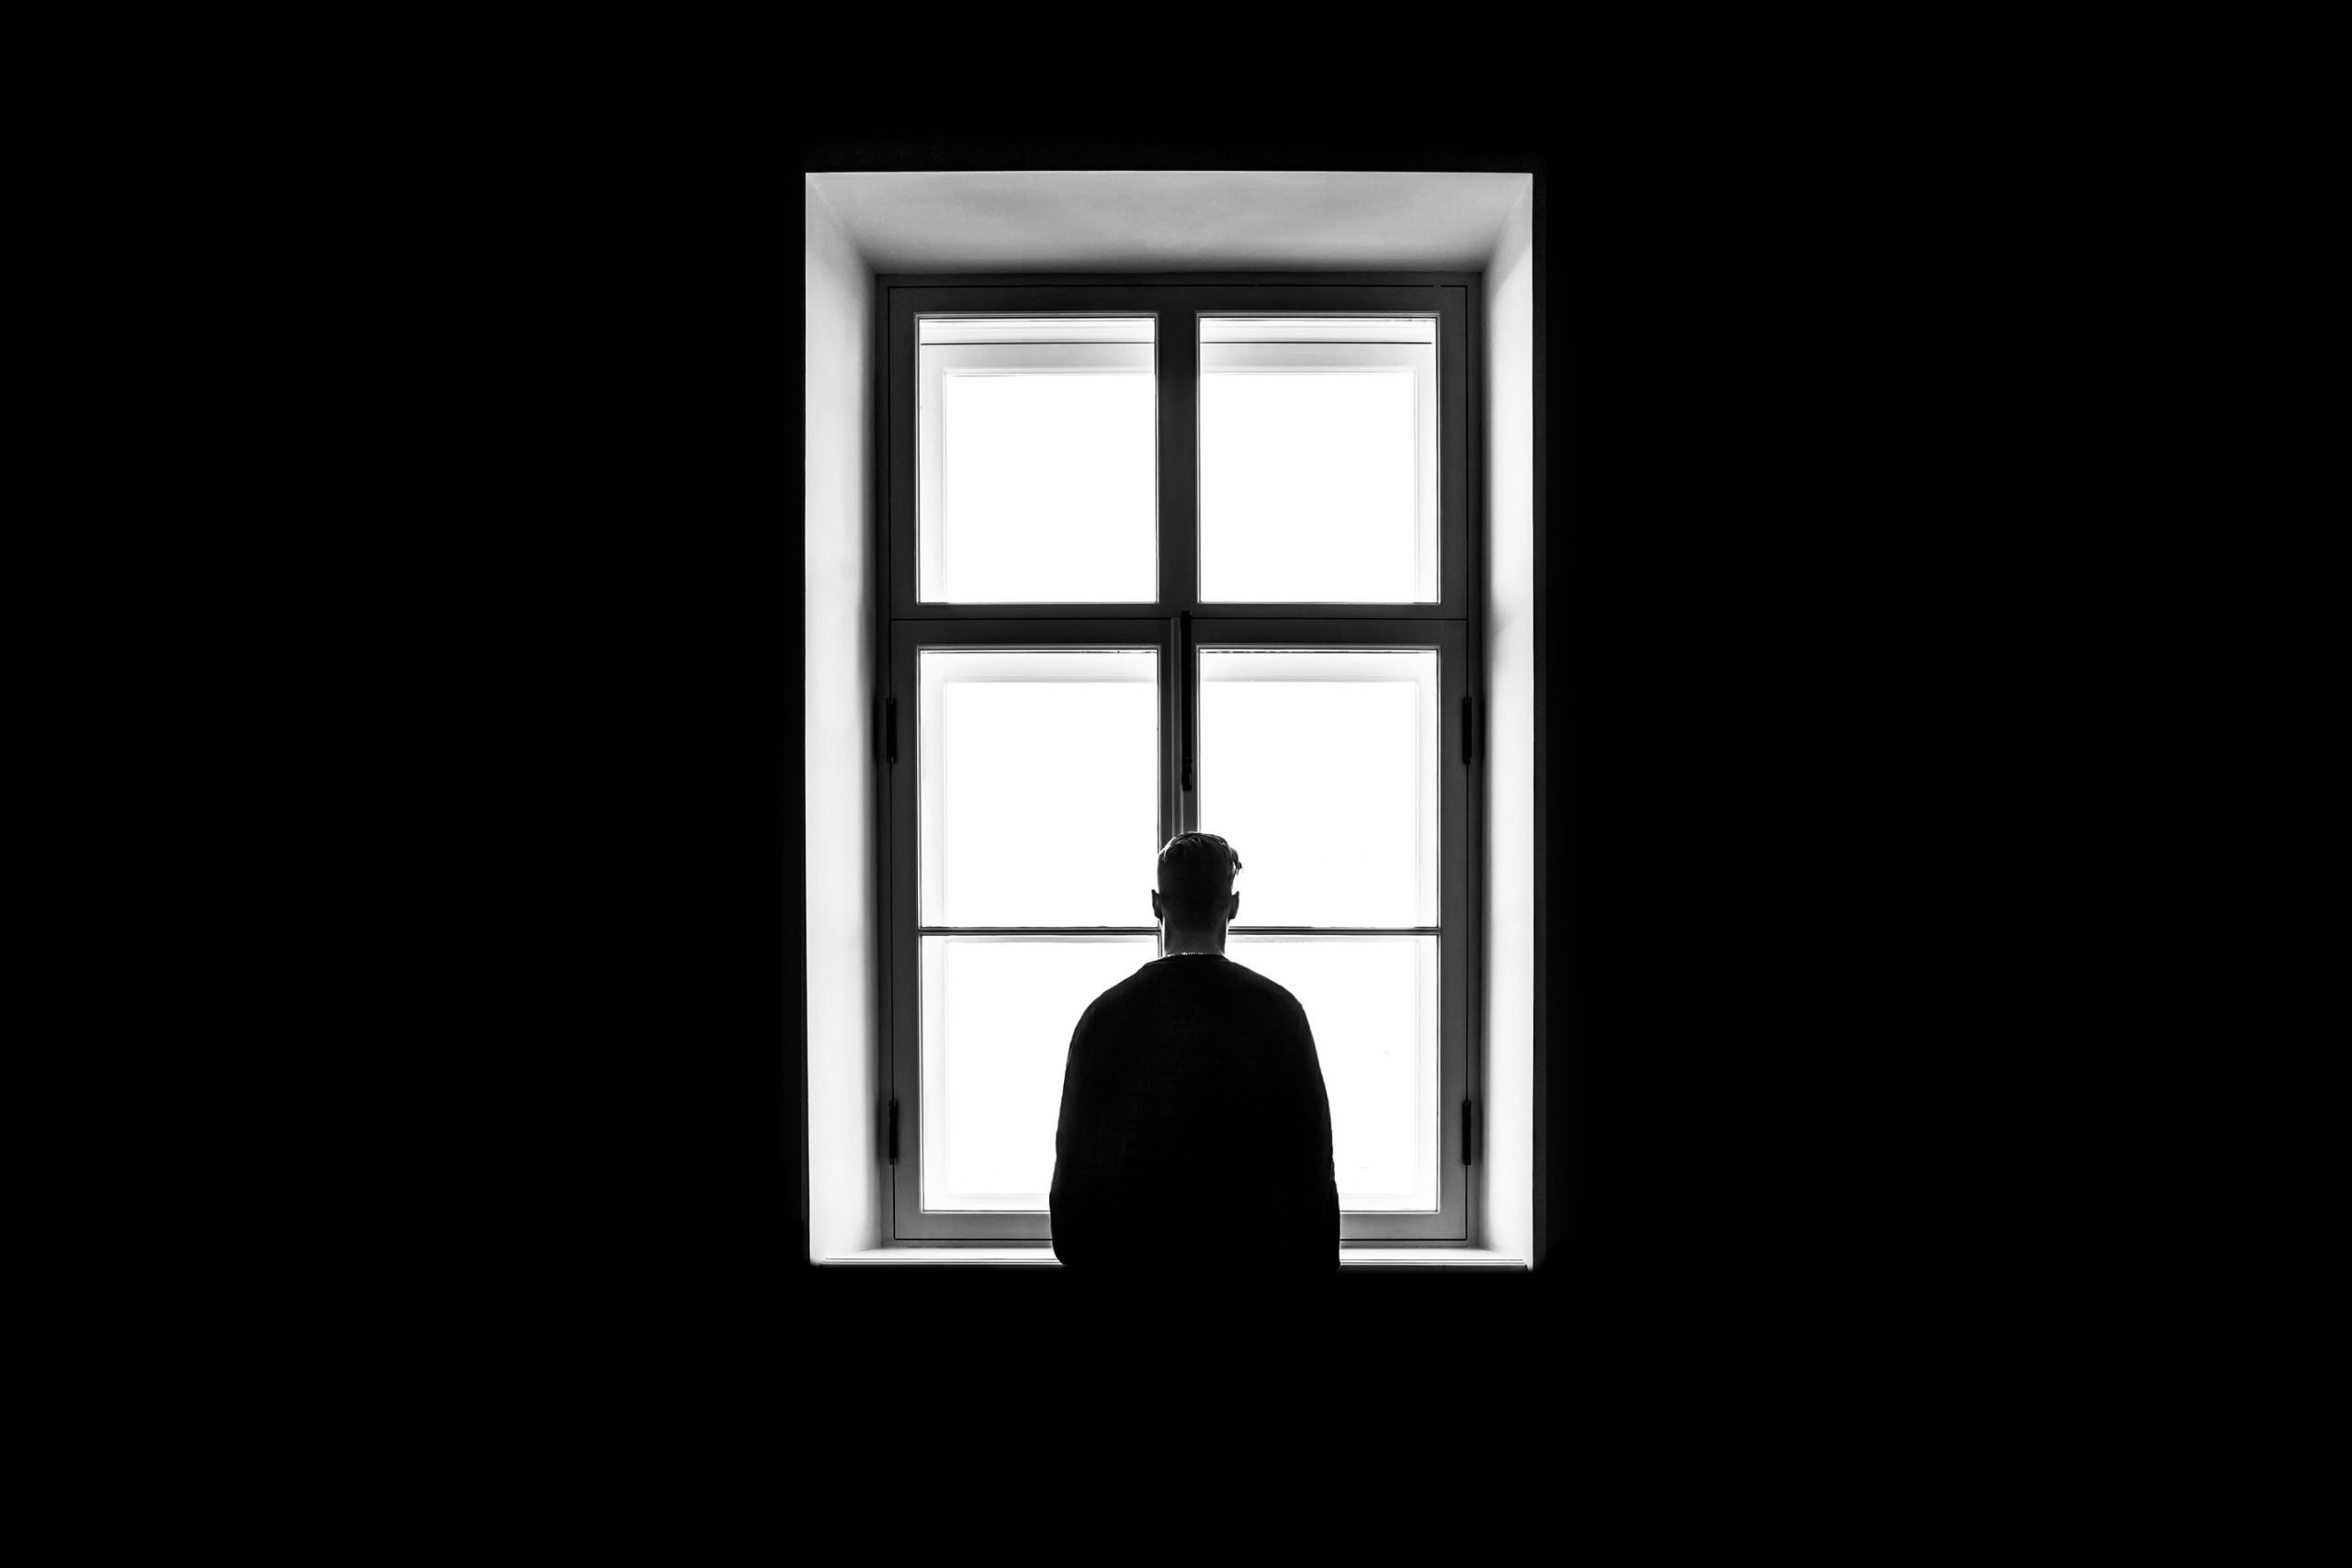 symptoms of depression in teens